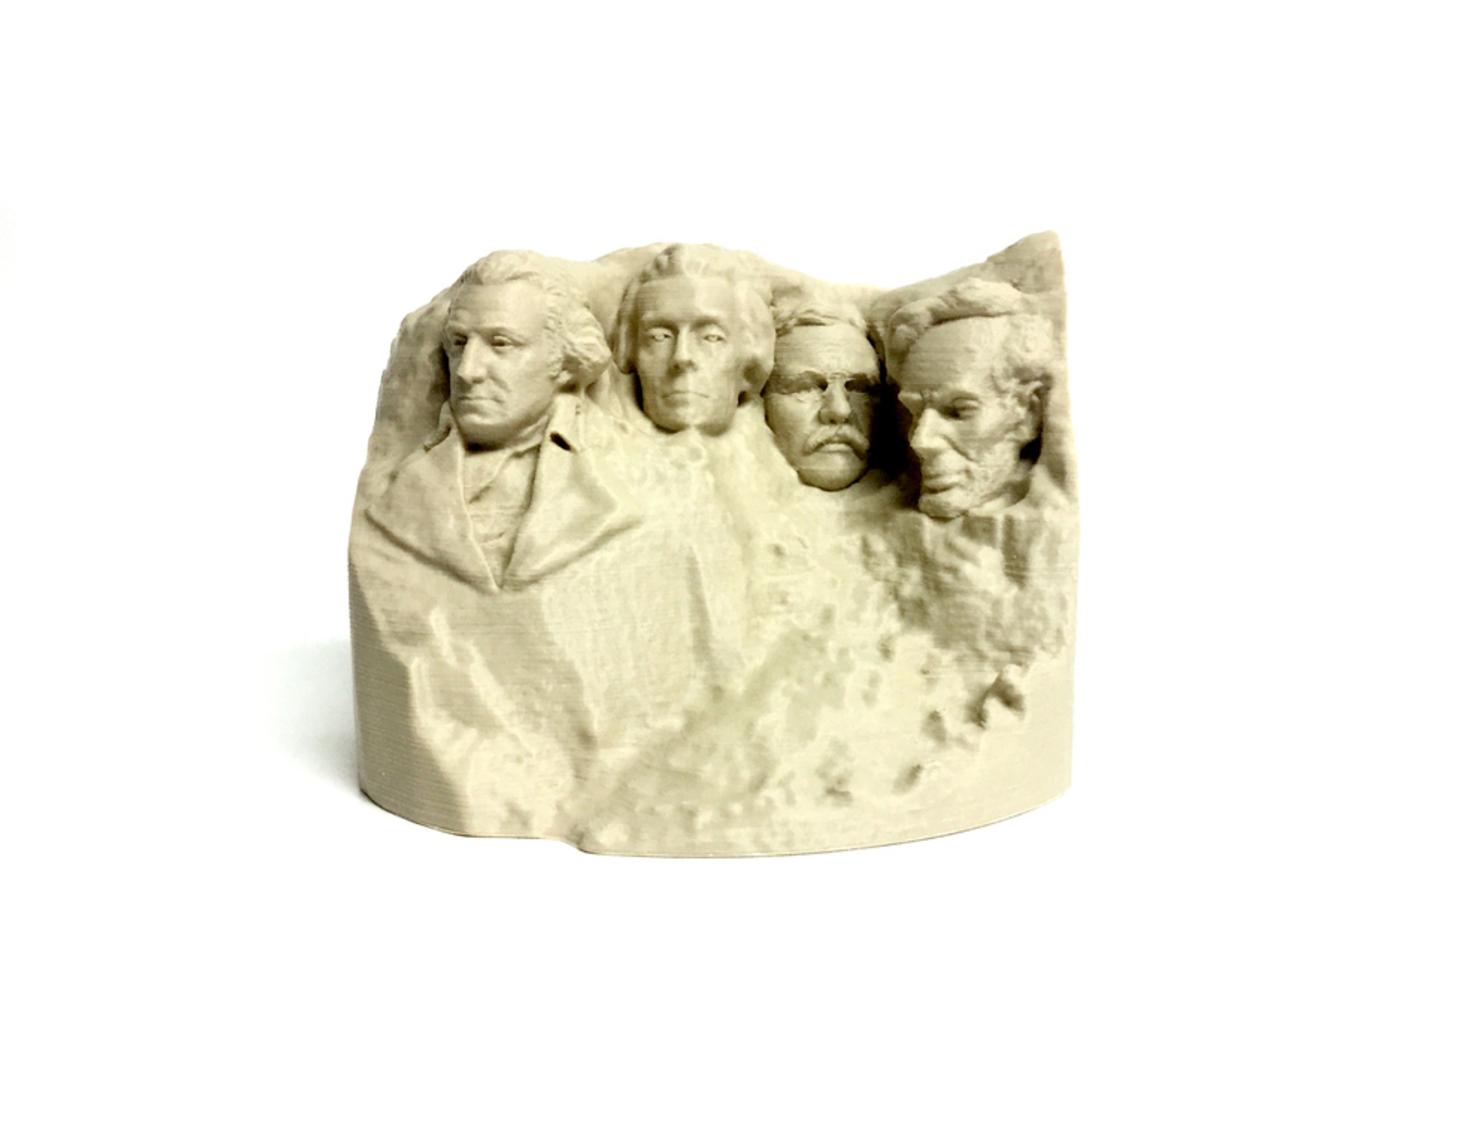 Capture d'écran 2017-09-21 à 12.54.01.png Download free STL file Stylized Mount Rushmore • Model to 3D print, 3DLirious